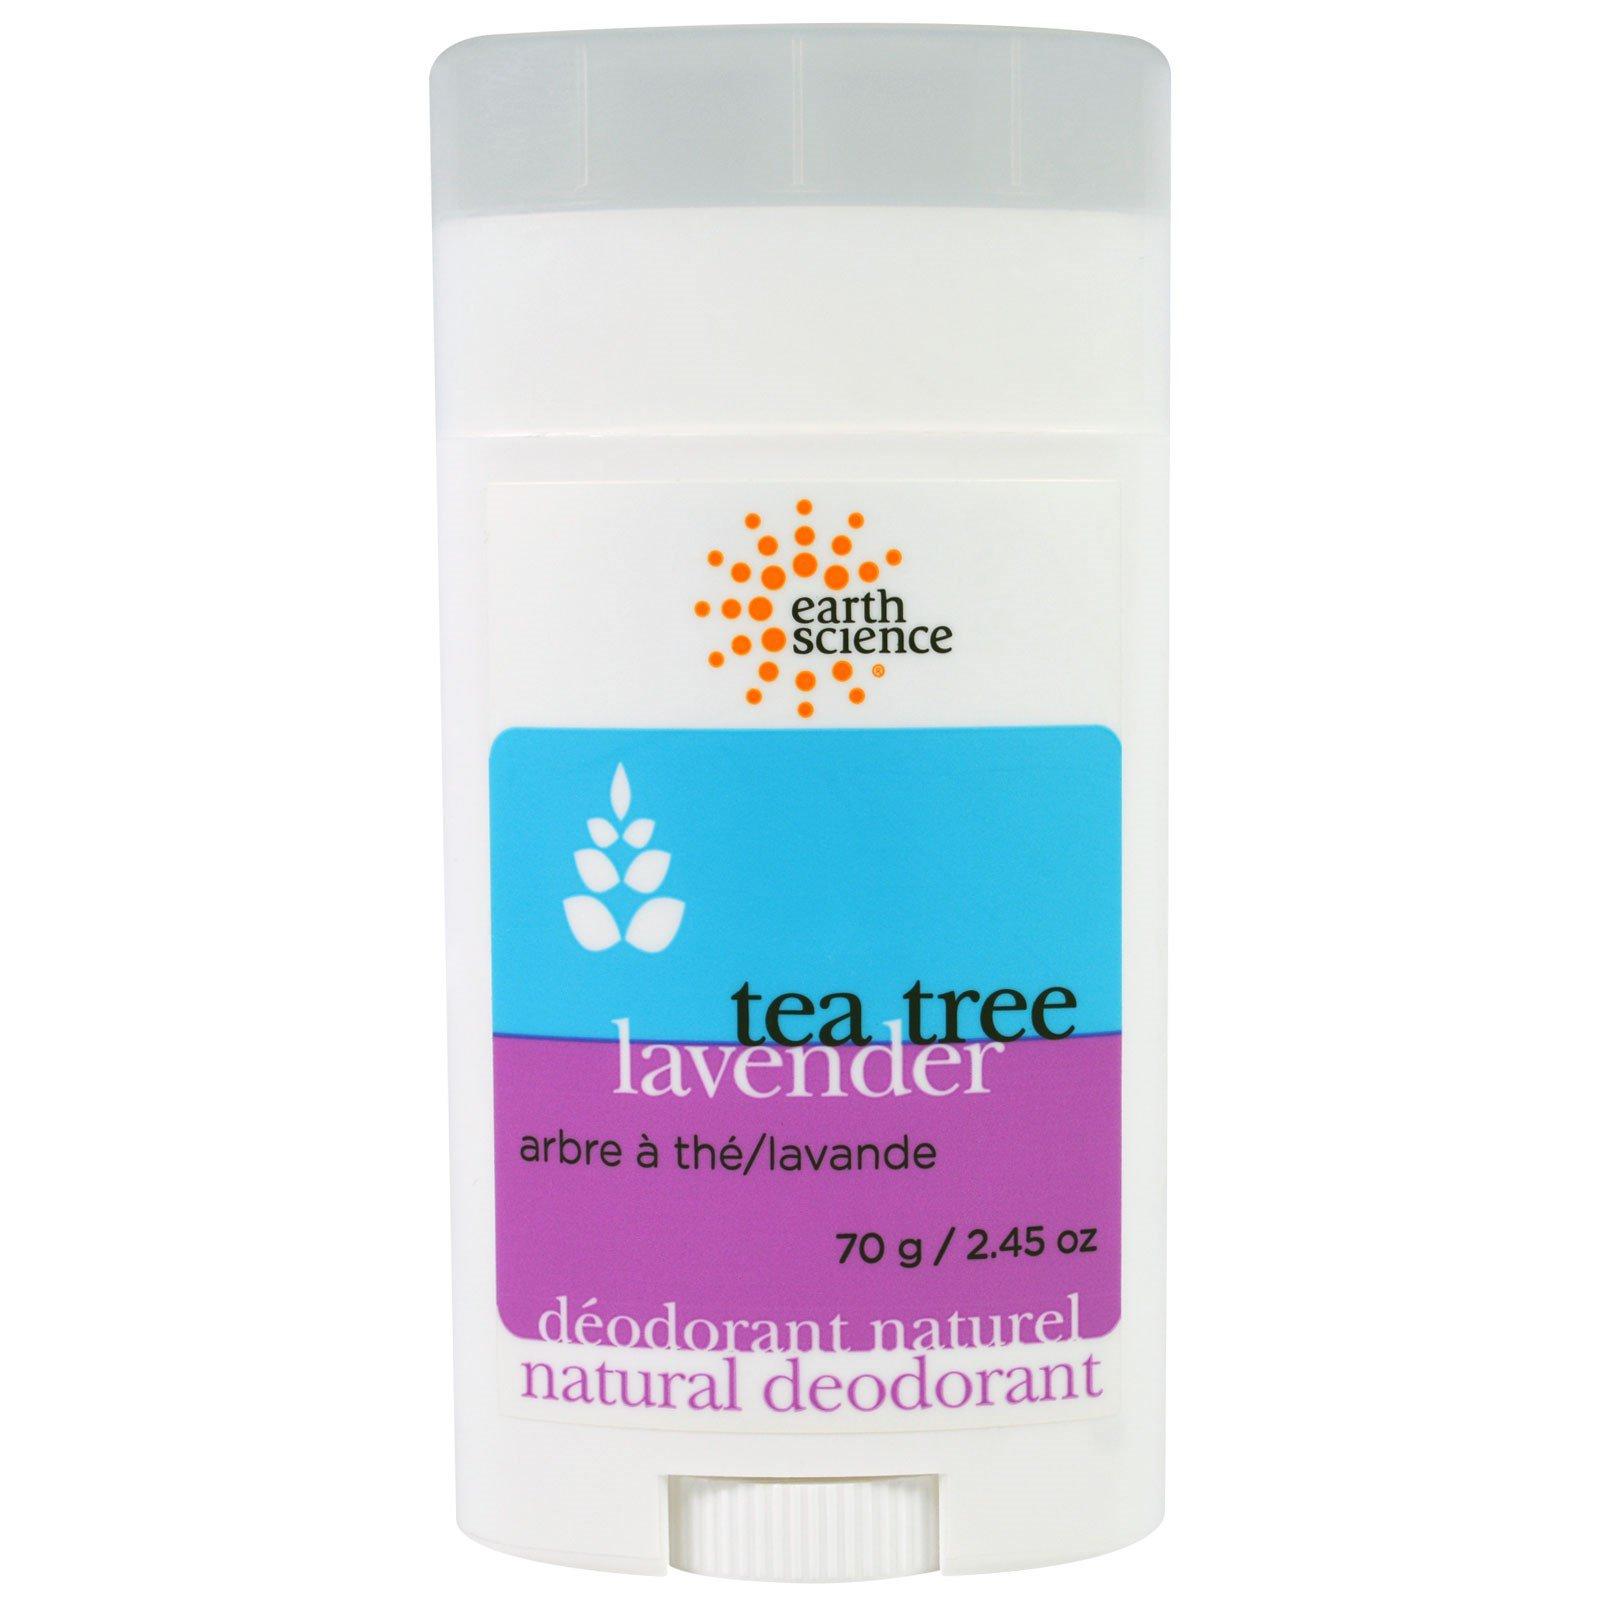 Earth Science, Натуральный дезодорант, чайное дерево, лаванда, 70 г